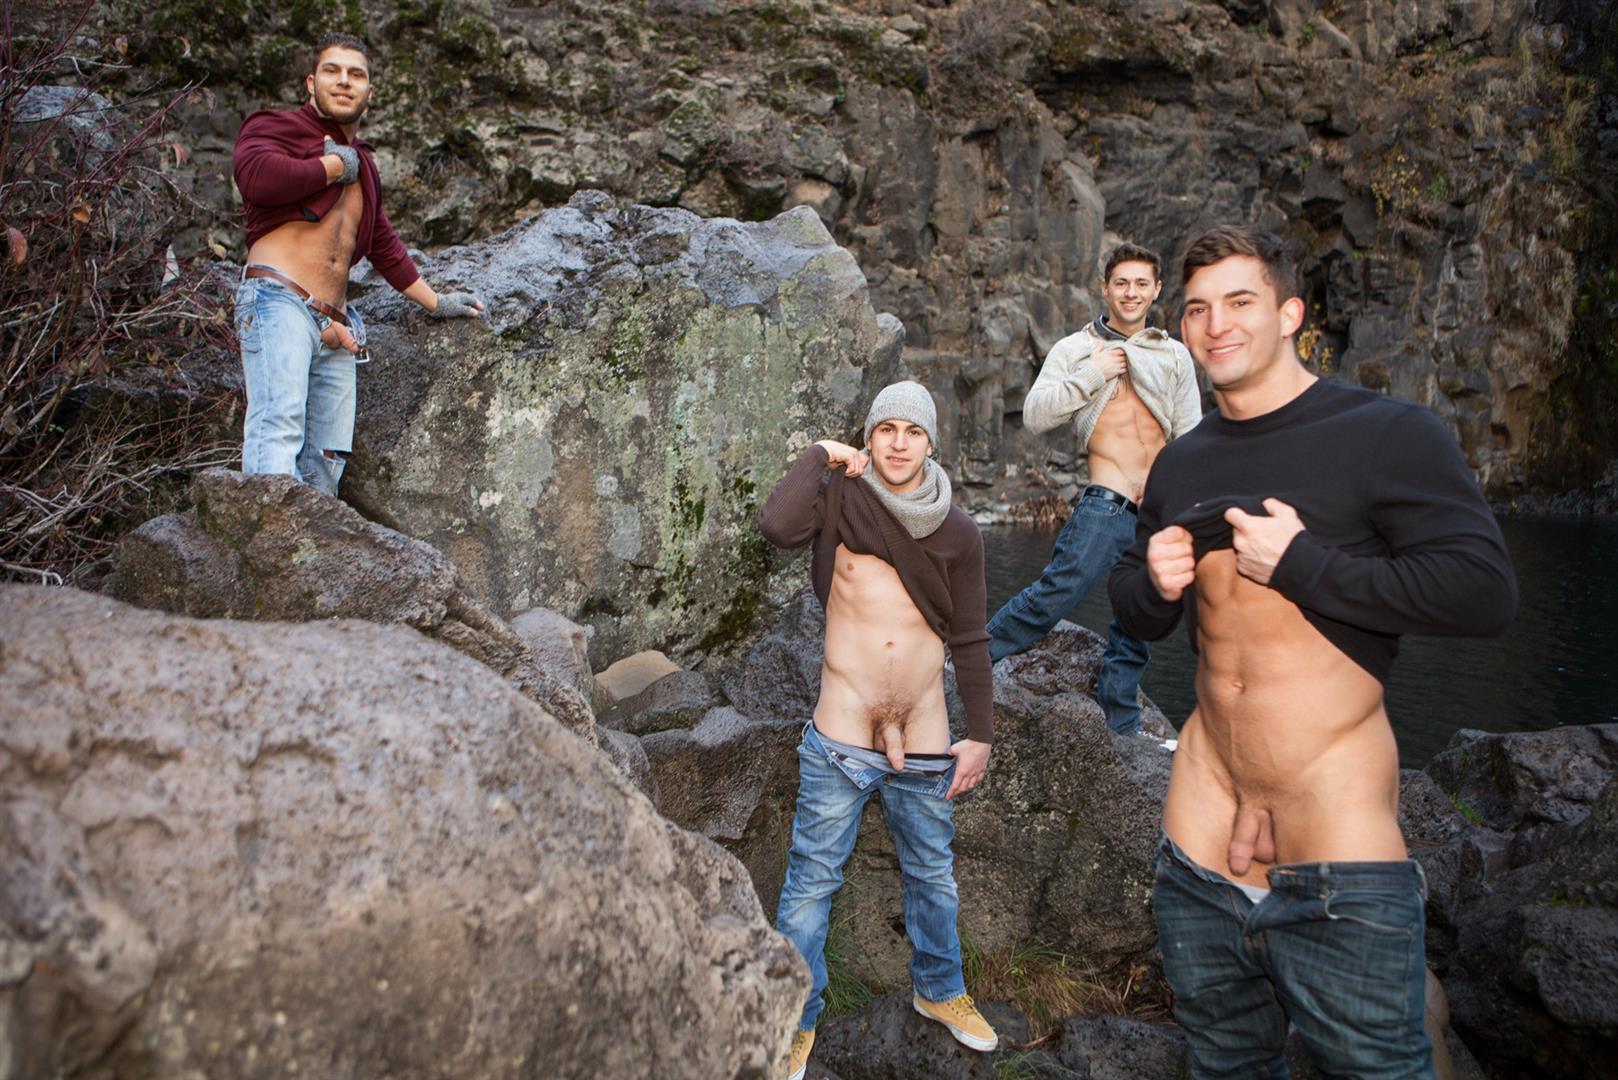 Sean-Cody-Winter-Getaway-Day-4-Big-Dick-Hunks-Fucking-Bareback-Amateur-Gay-Porn-03 Sean Cody Takes The Boys On A 8-Day Bareback Winter Getaway